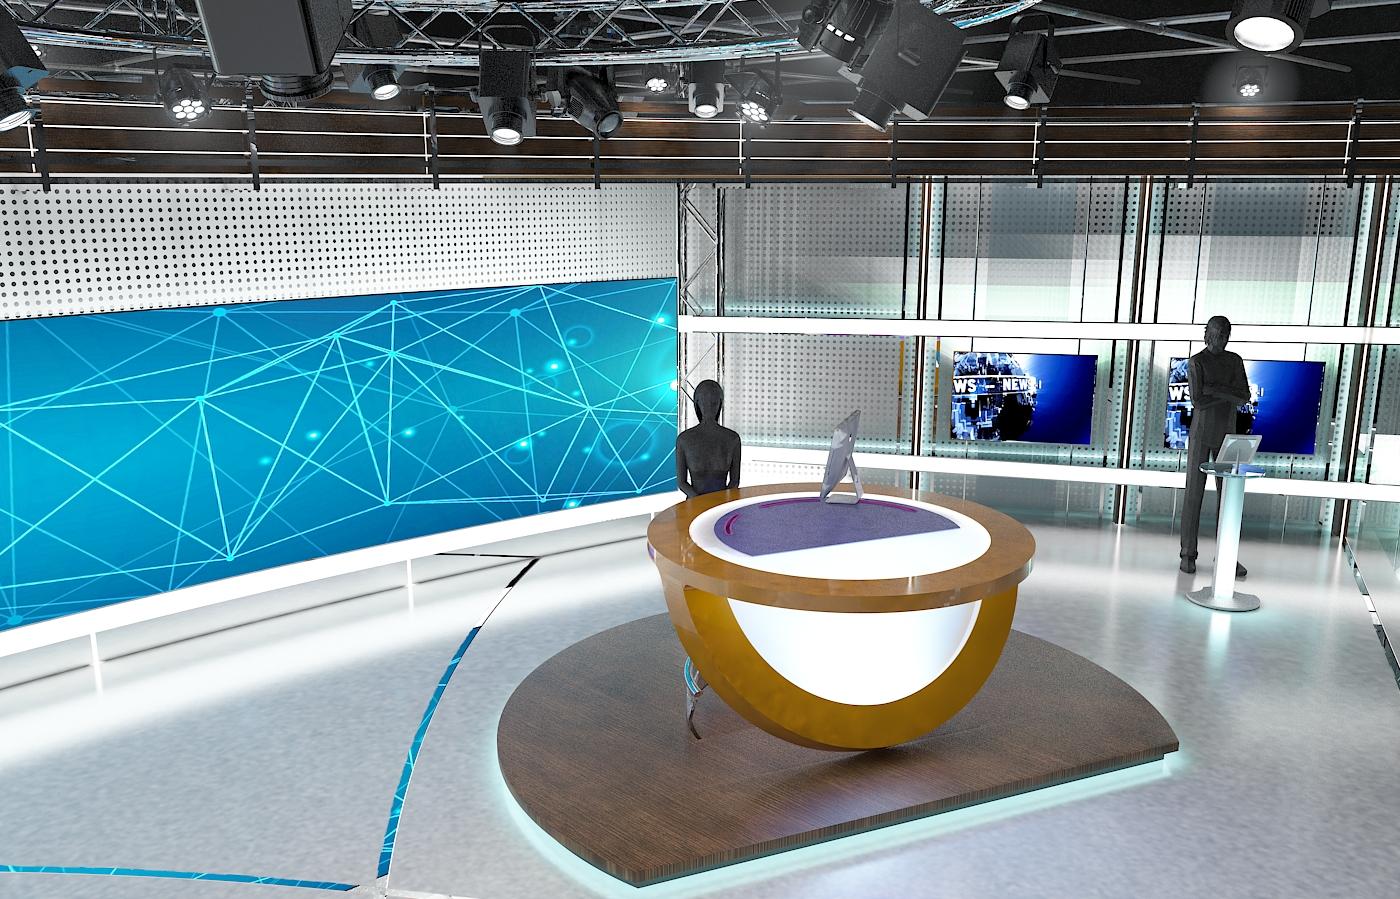 виртуал телевизийн студи цуглуулга vol 6 3d загвар max dxf dwg fbx obj 223410